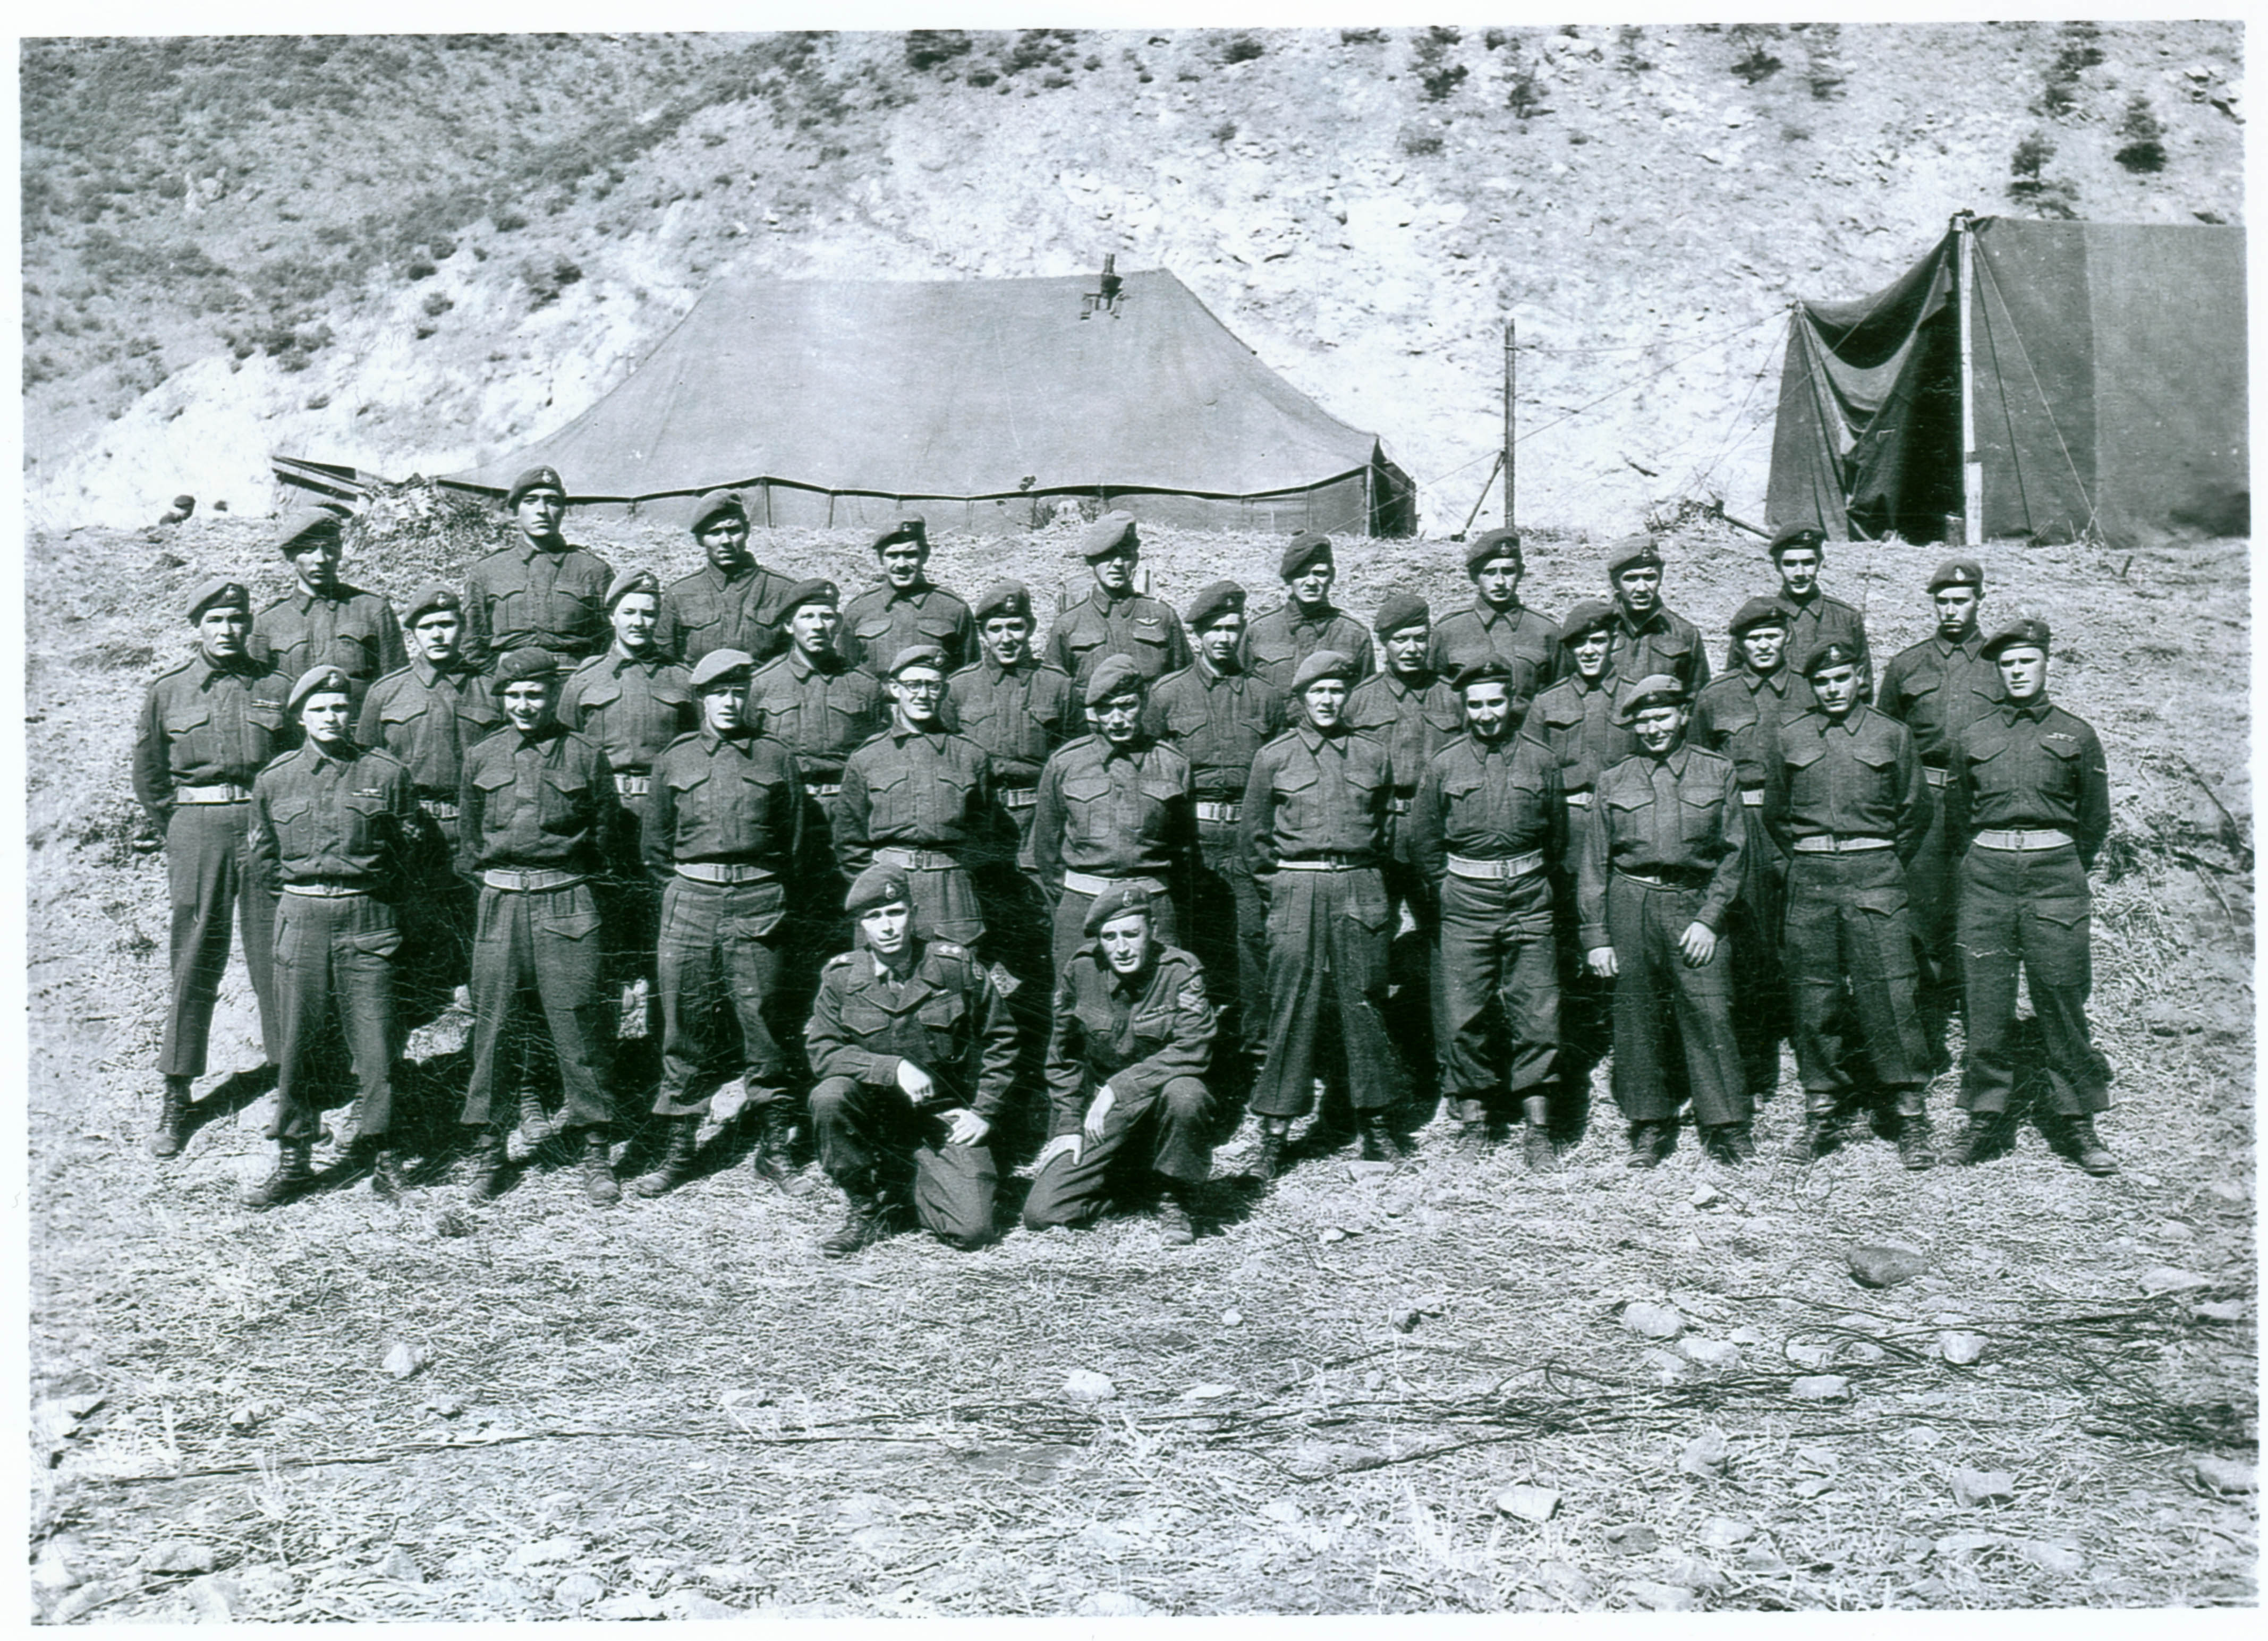 6 Platoon, C Company, 2nd Battalion, Princess Patricia's Canadian Light Infantry.